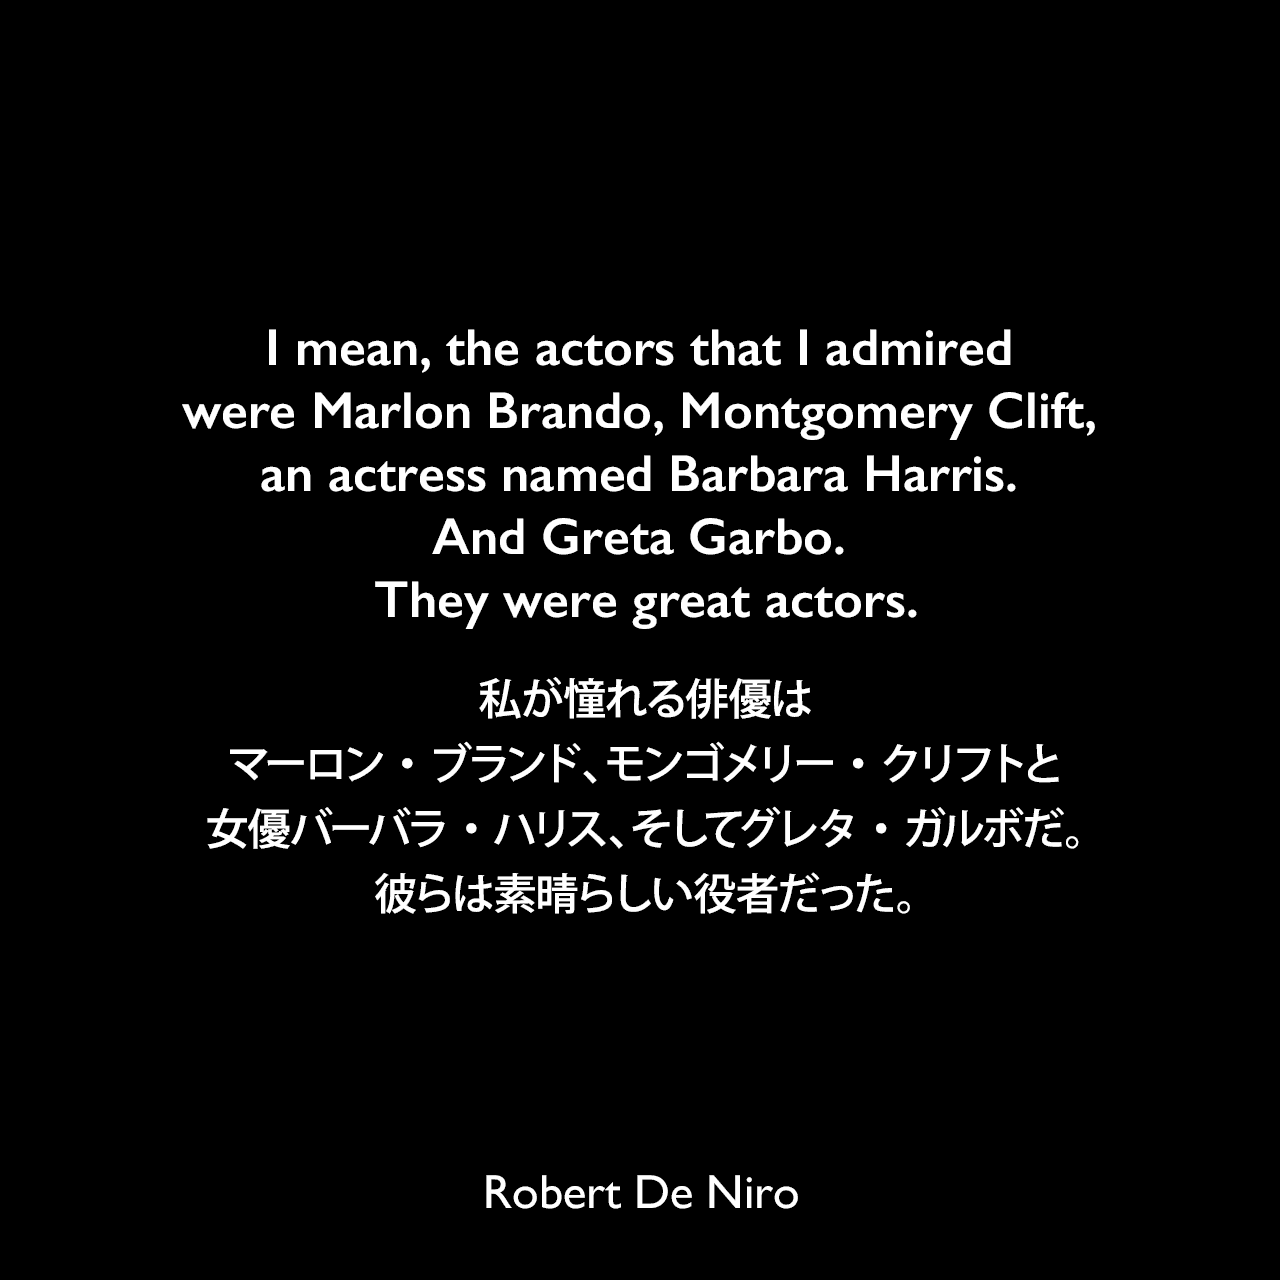 I mean, the actors that I admired were Marlon Brando, Montgomery Clift, an actress named Barbara Harris. And Greta Garbo. They were great actors.私が憧れる俳優は、マーロン・ブランド、モンゴメリー・クリフトと女優バーバラ・ハリス、そしてグレタ・ガルボだ。彼らは素晴らしい役者だった。Robert De Niro